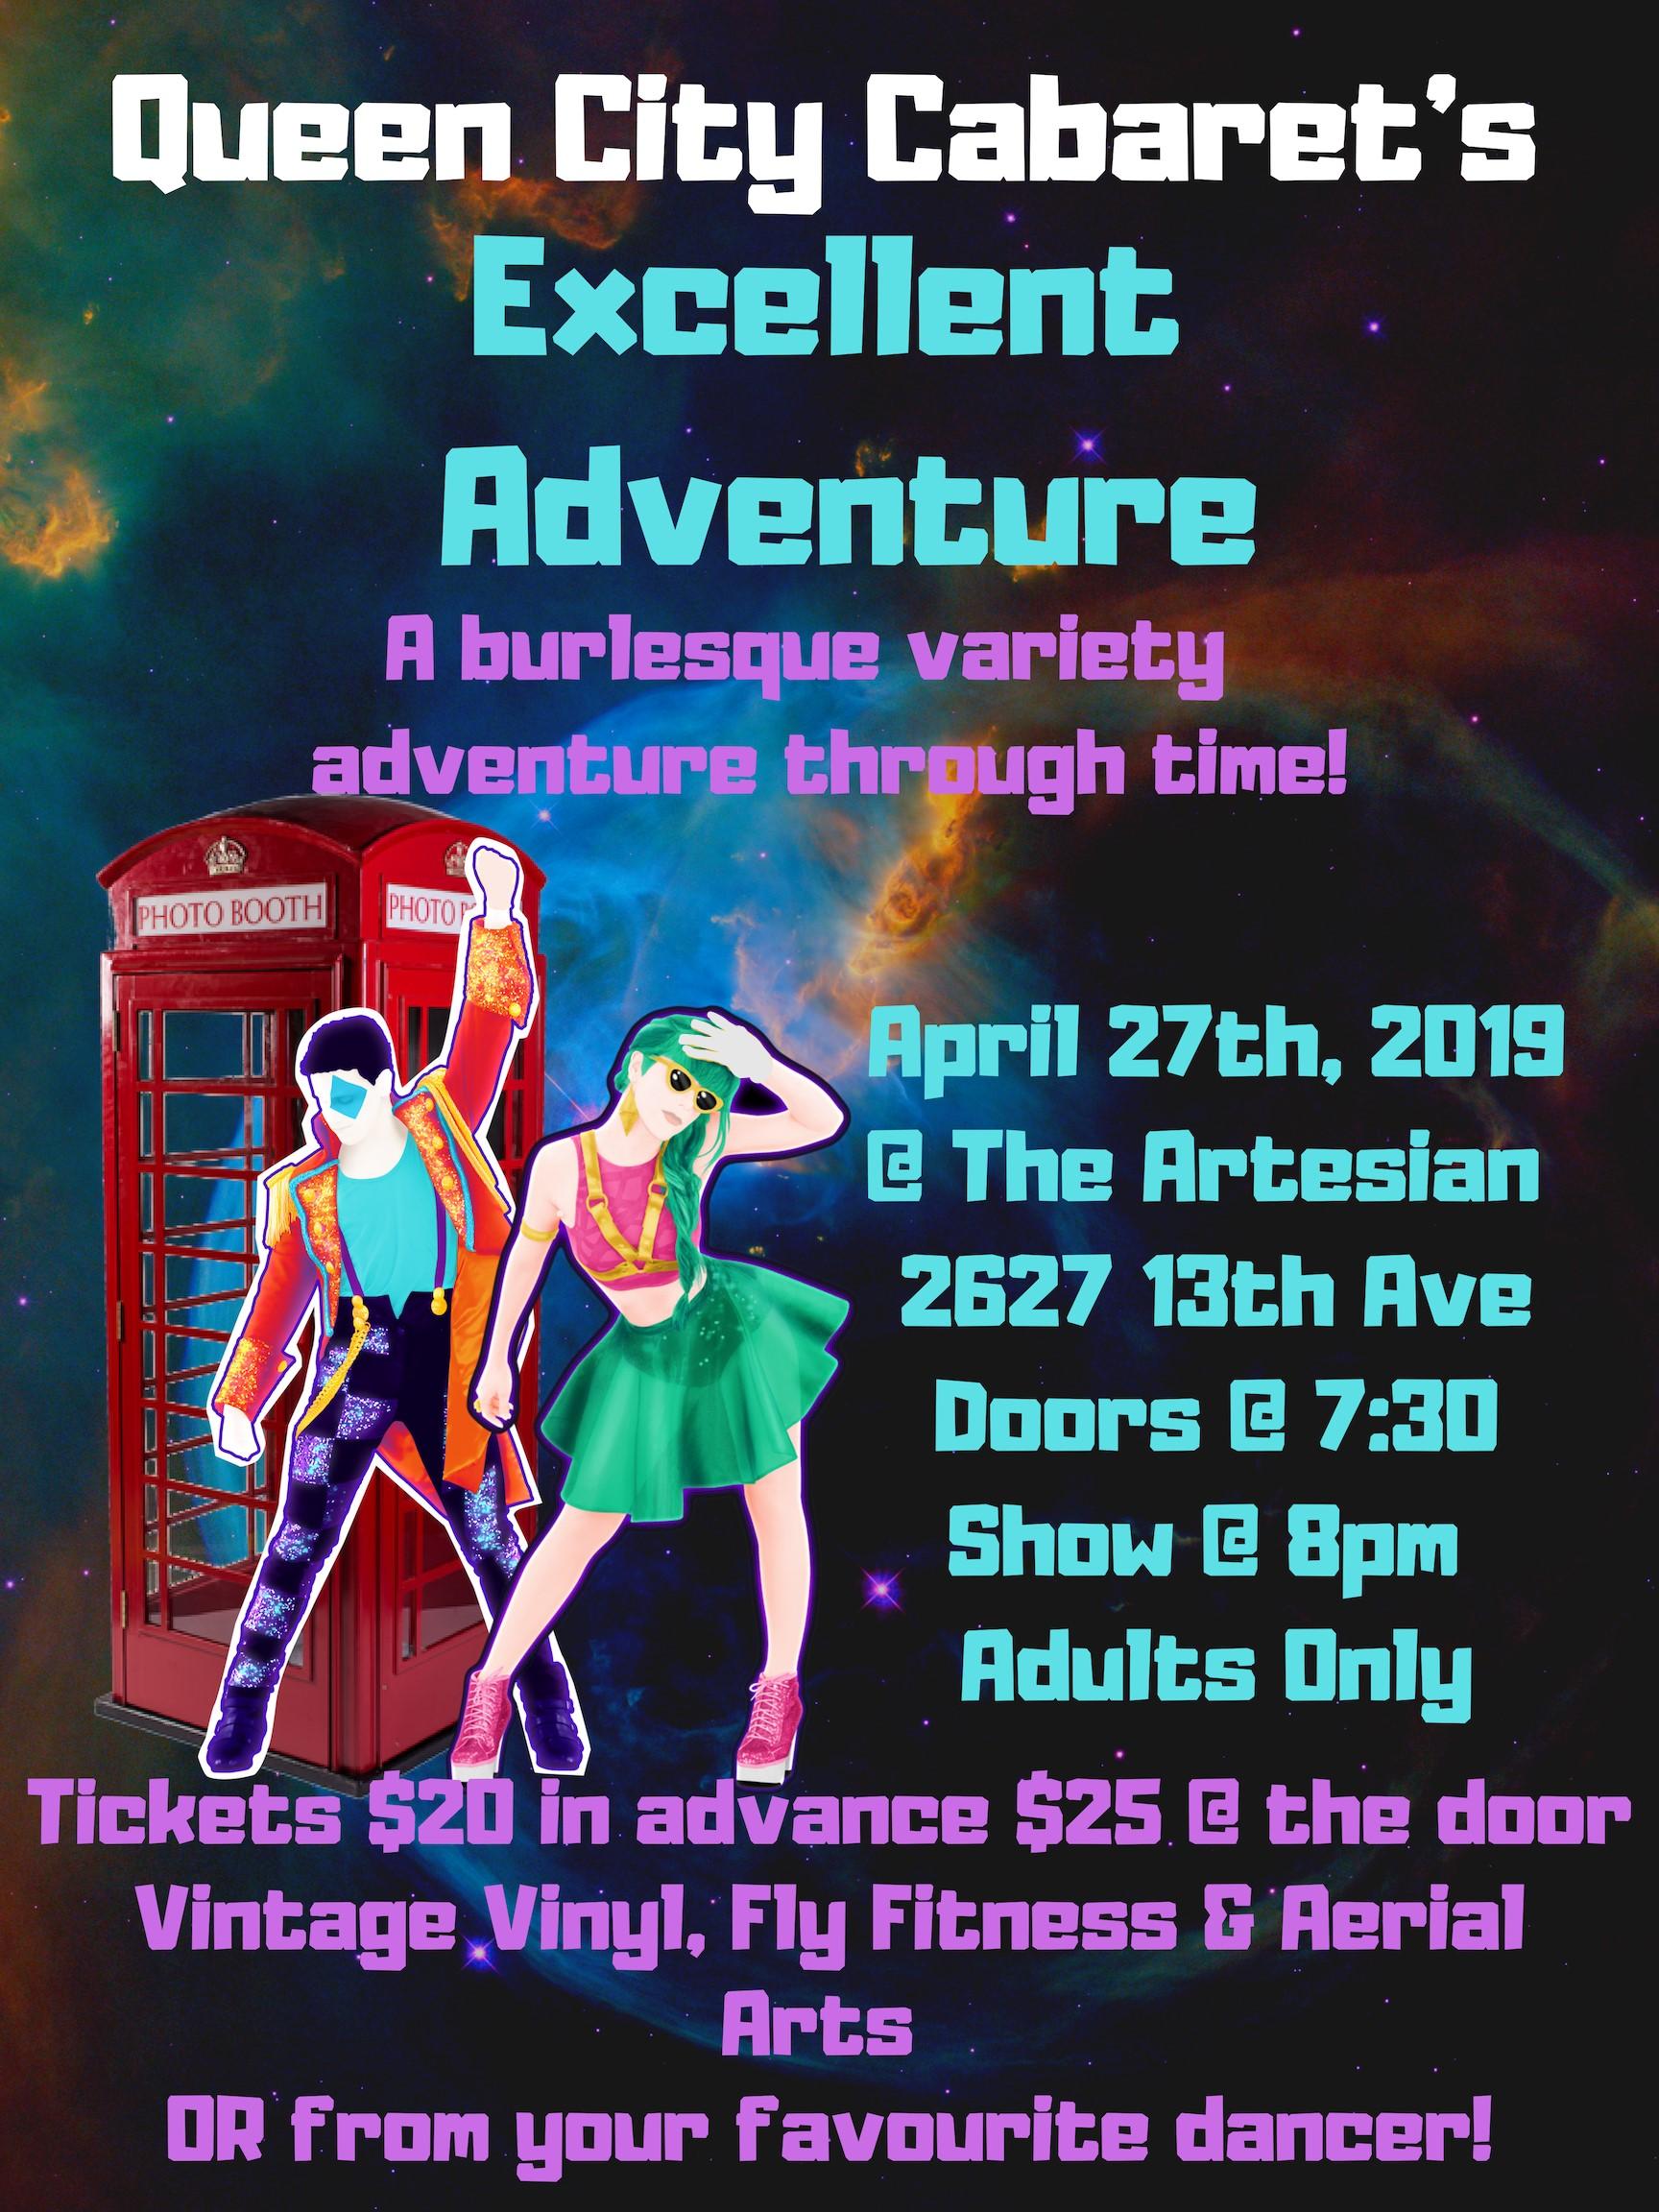 Queen City Cabaret's Excellent Adventure